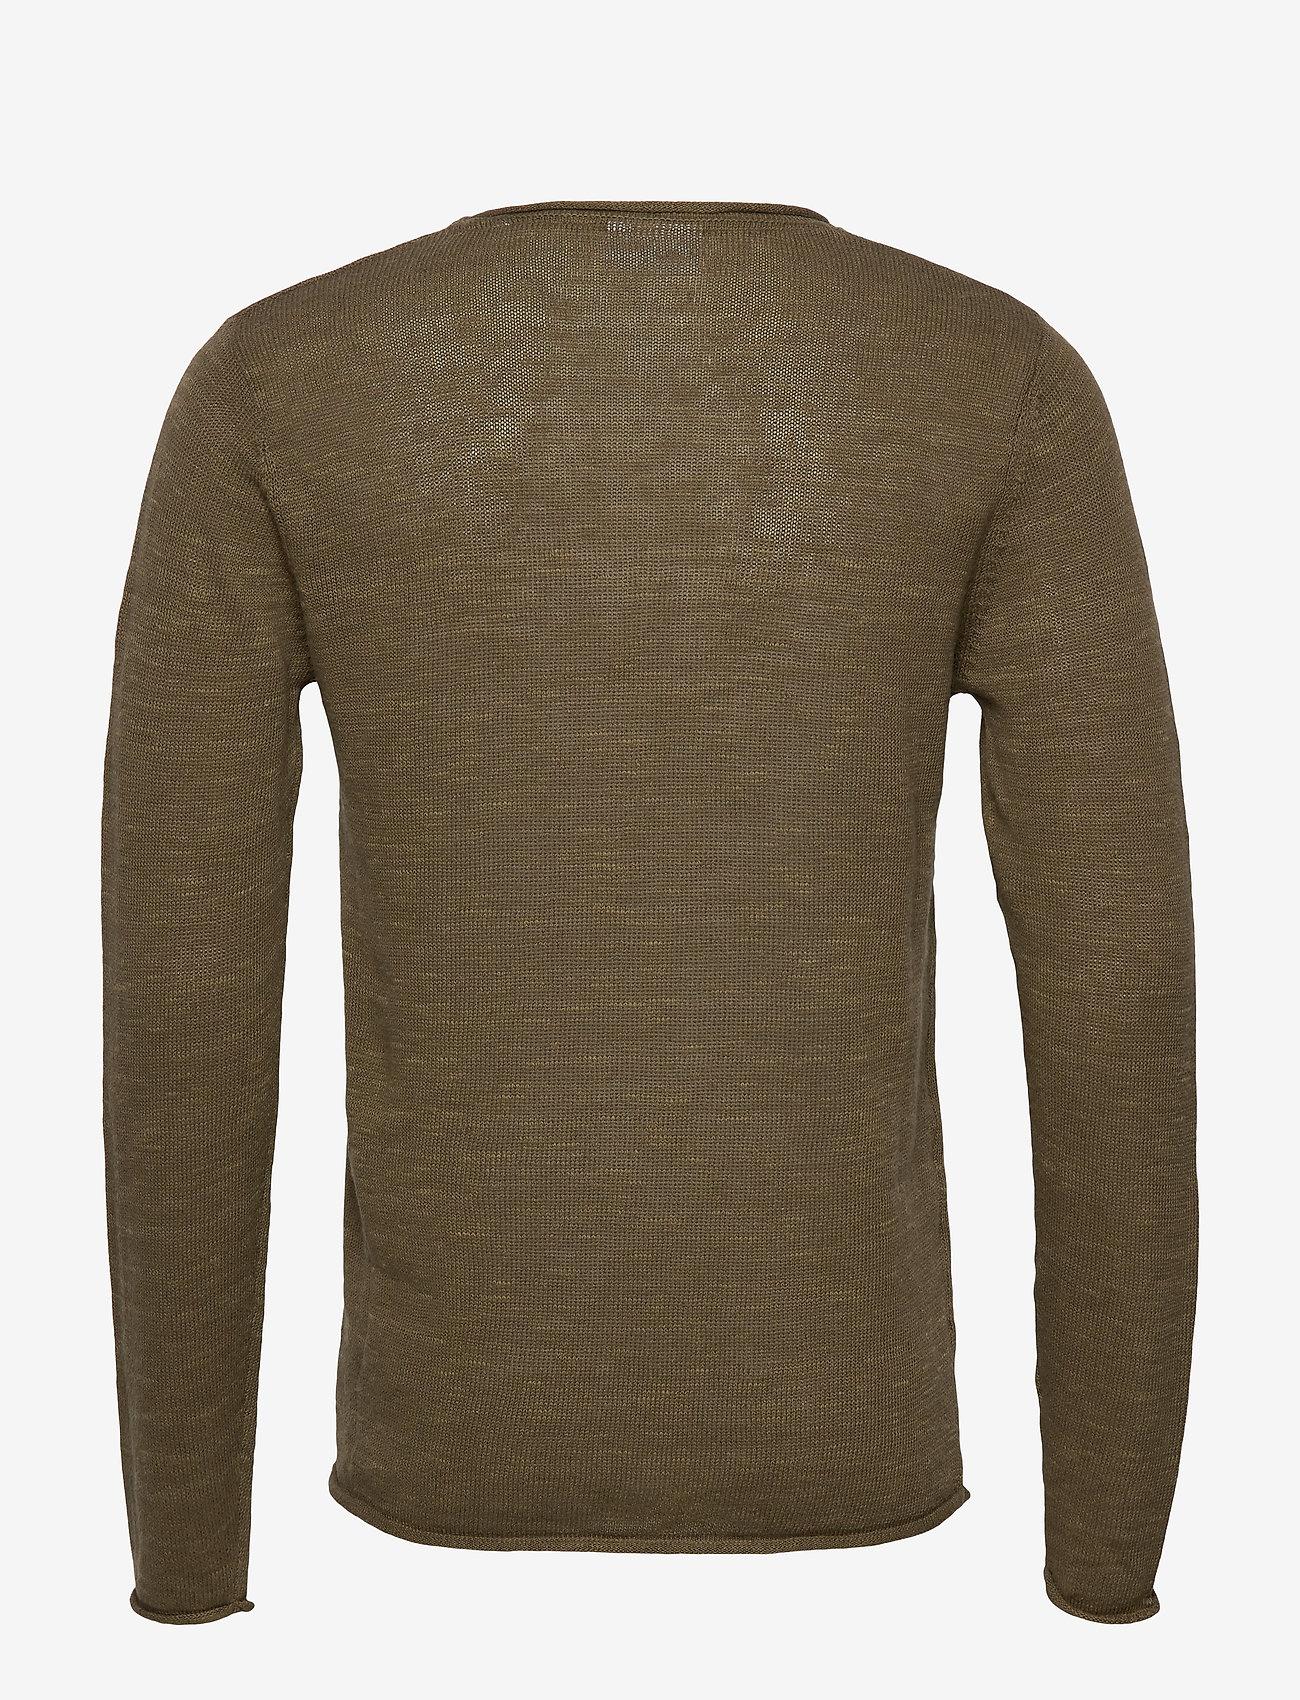 Lindbergh Casual knit - Strikkevarer ARMY MEL - Menn Klær